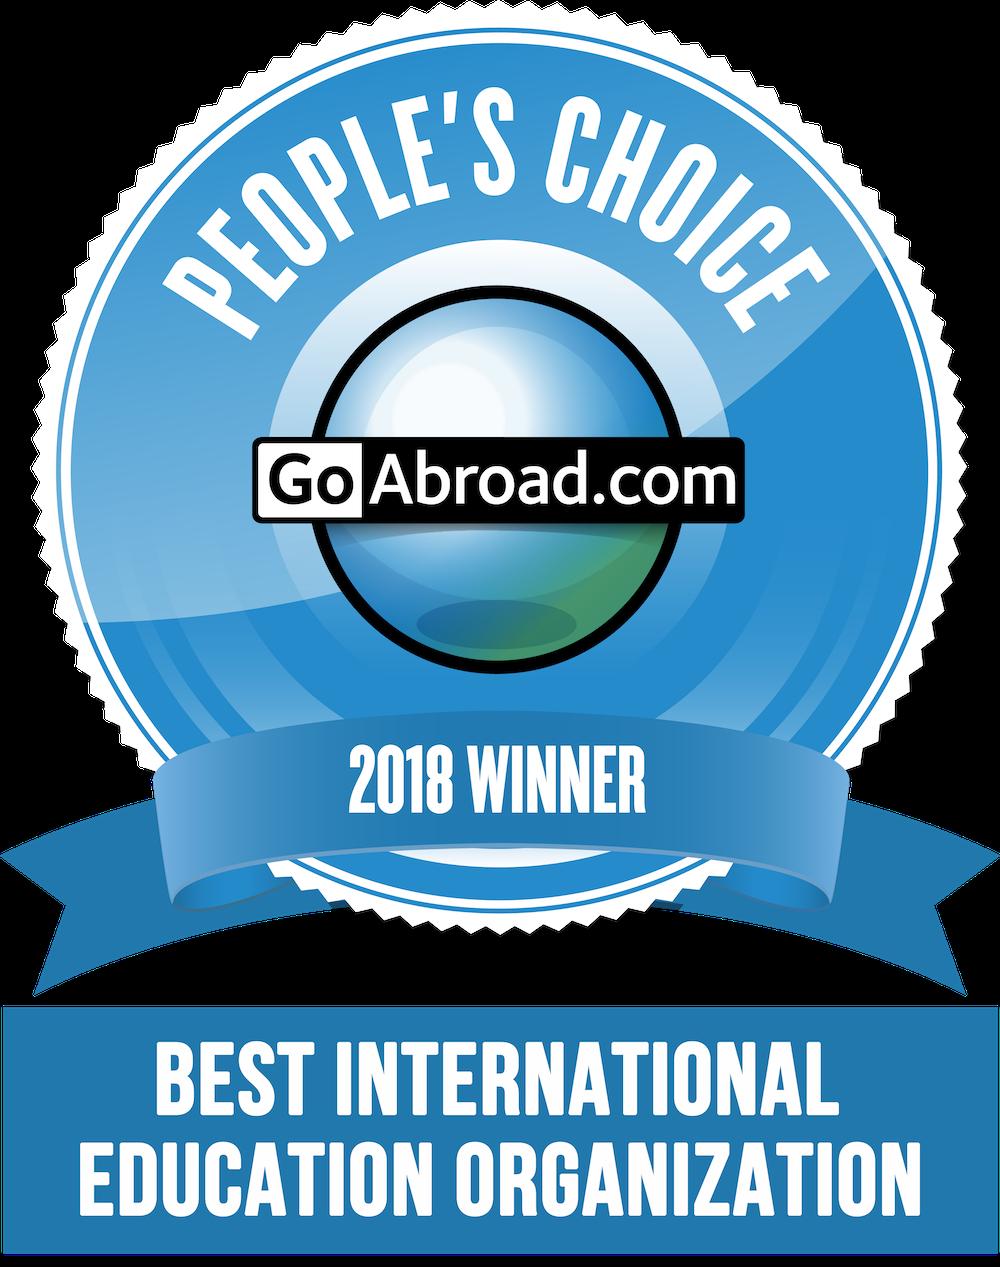 International TEFL Academy is First TEFL Provider to Win The GoAbroad Award For Best International Educational Organization